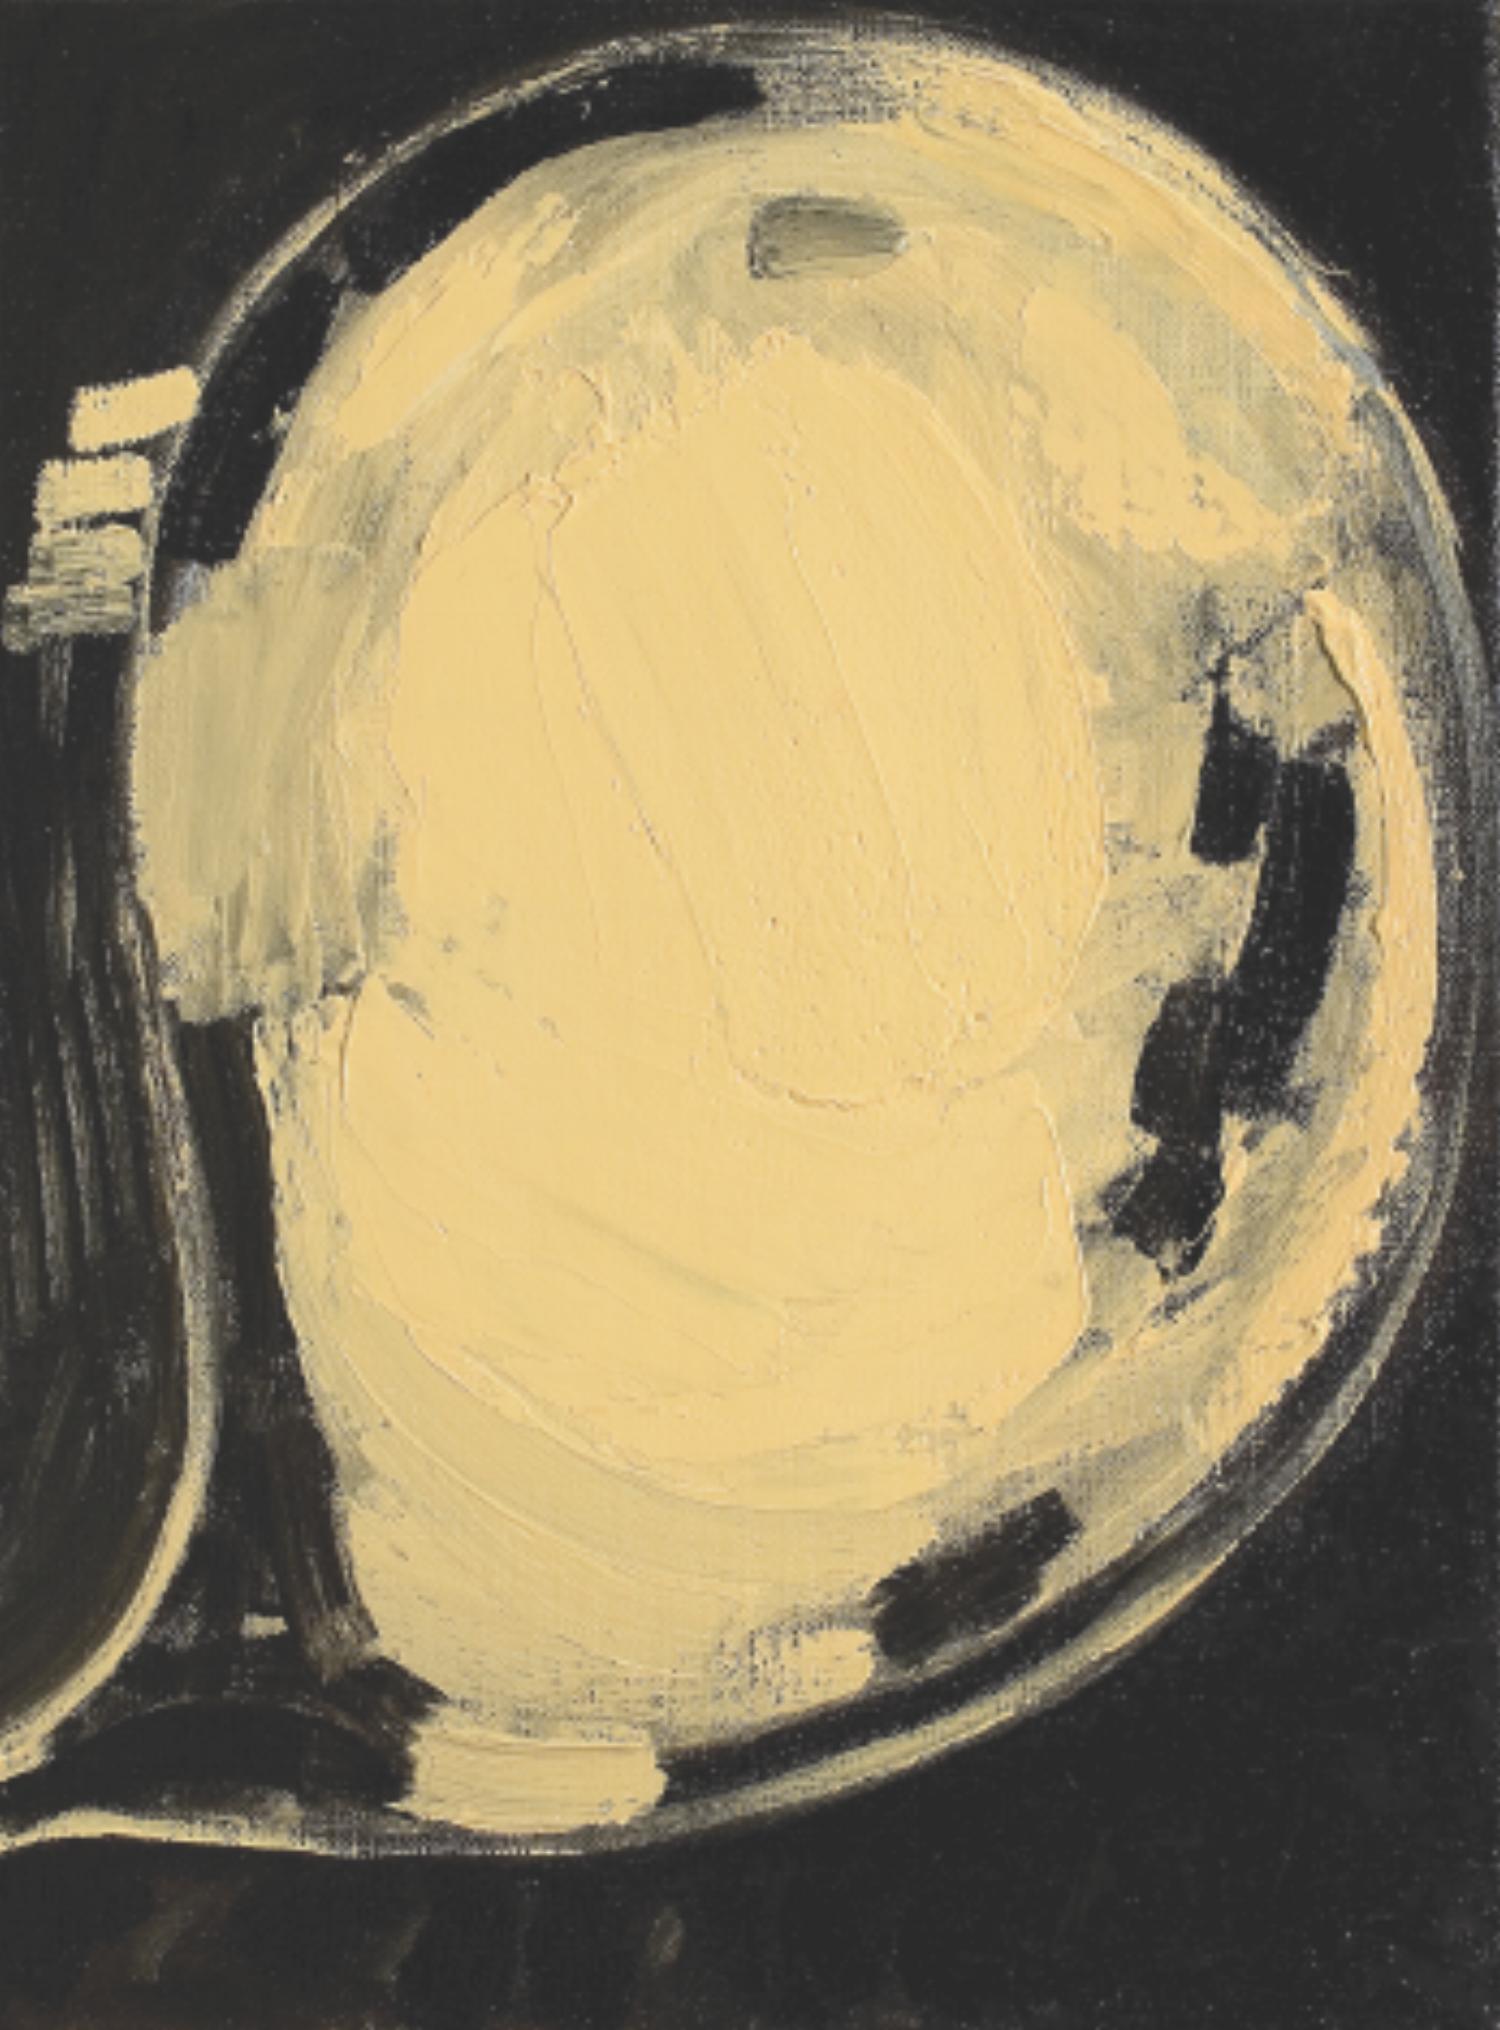 Mira Schor,  Portrait of My Brain , 2007. Oil on linen, 16 x 12 in.